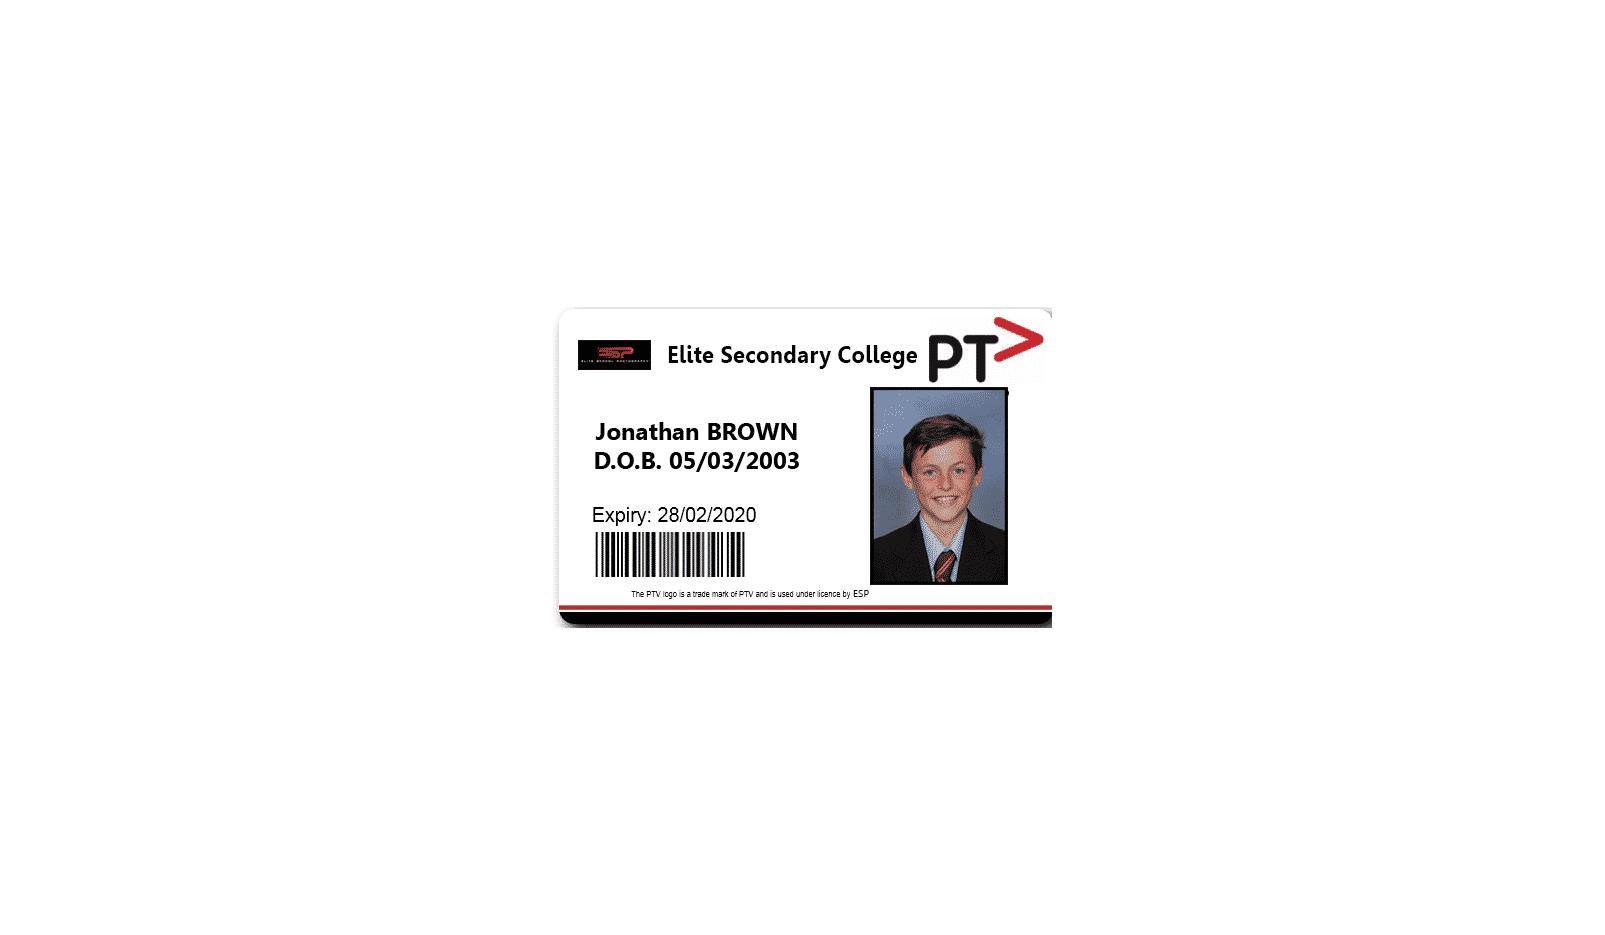 Ukuran-ID-Card-Nasional-Internasional-KTP-Kartu-Nama-dsb